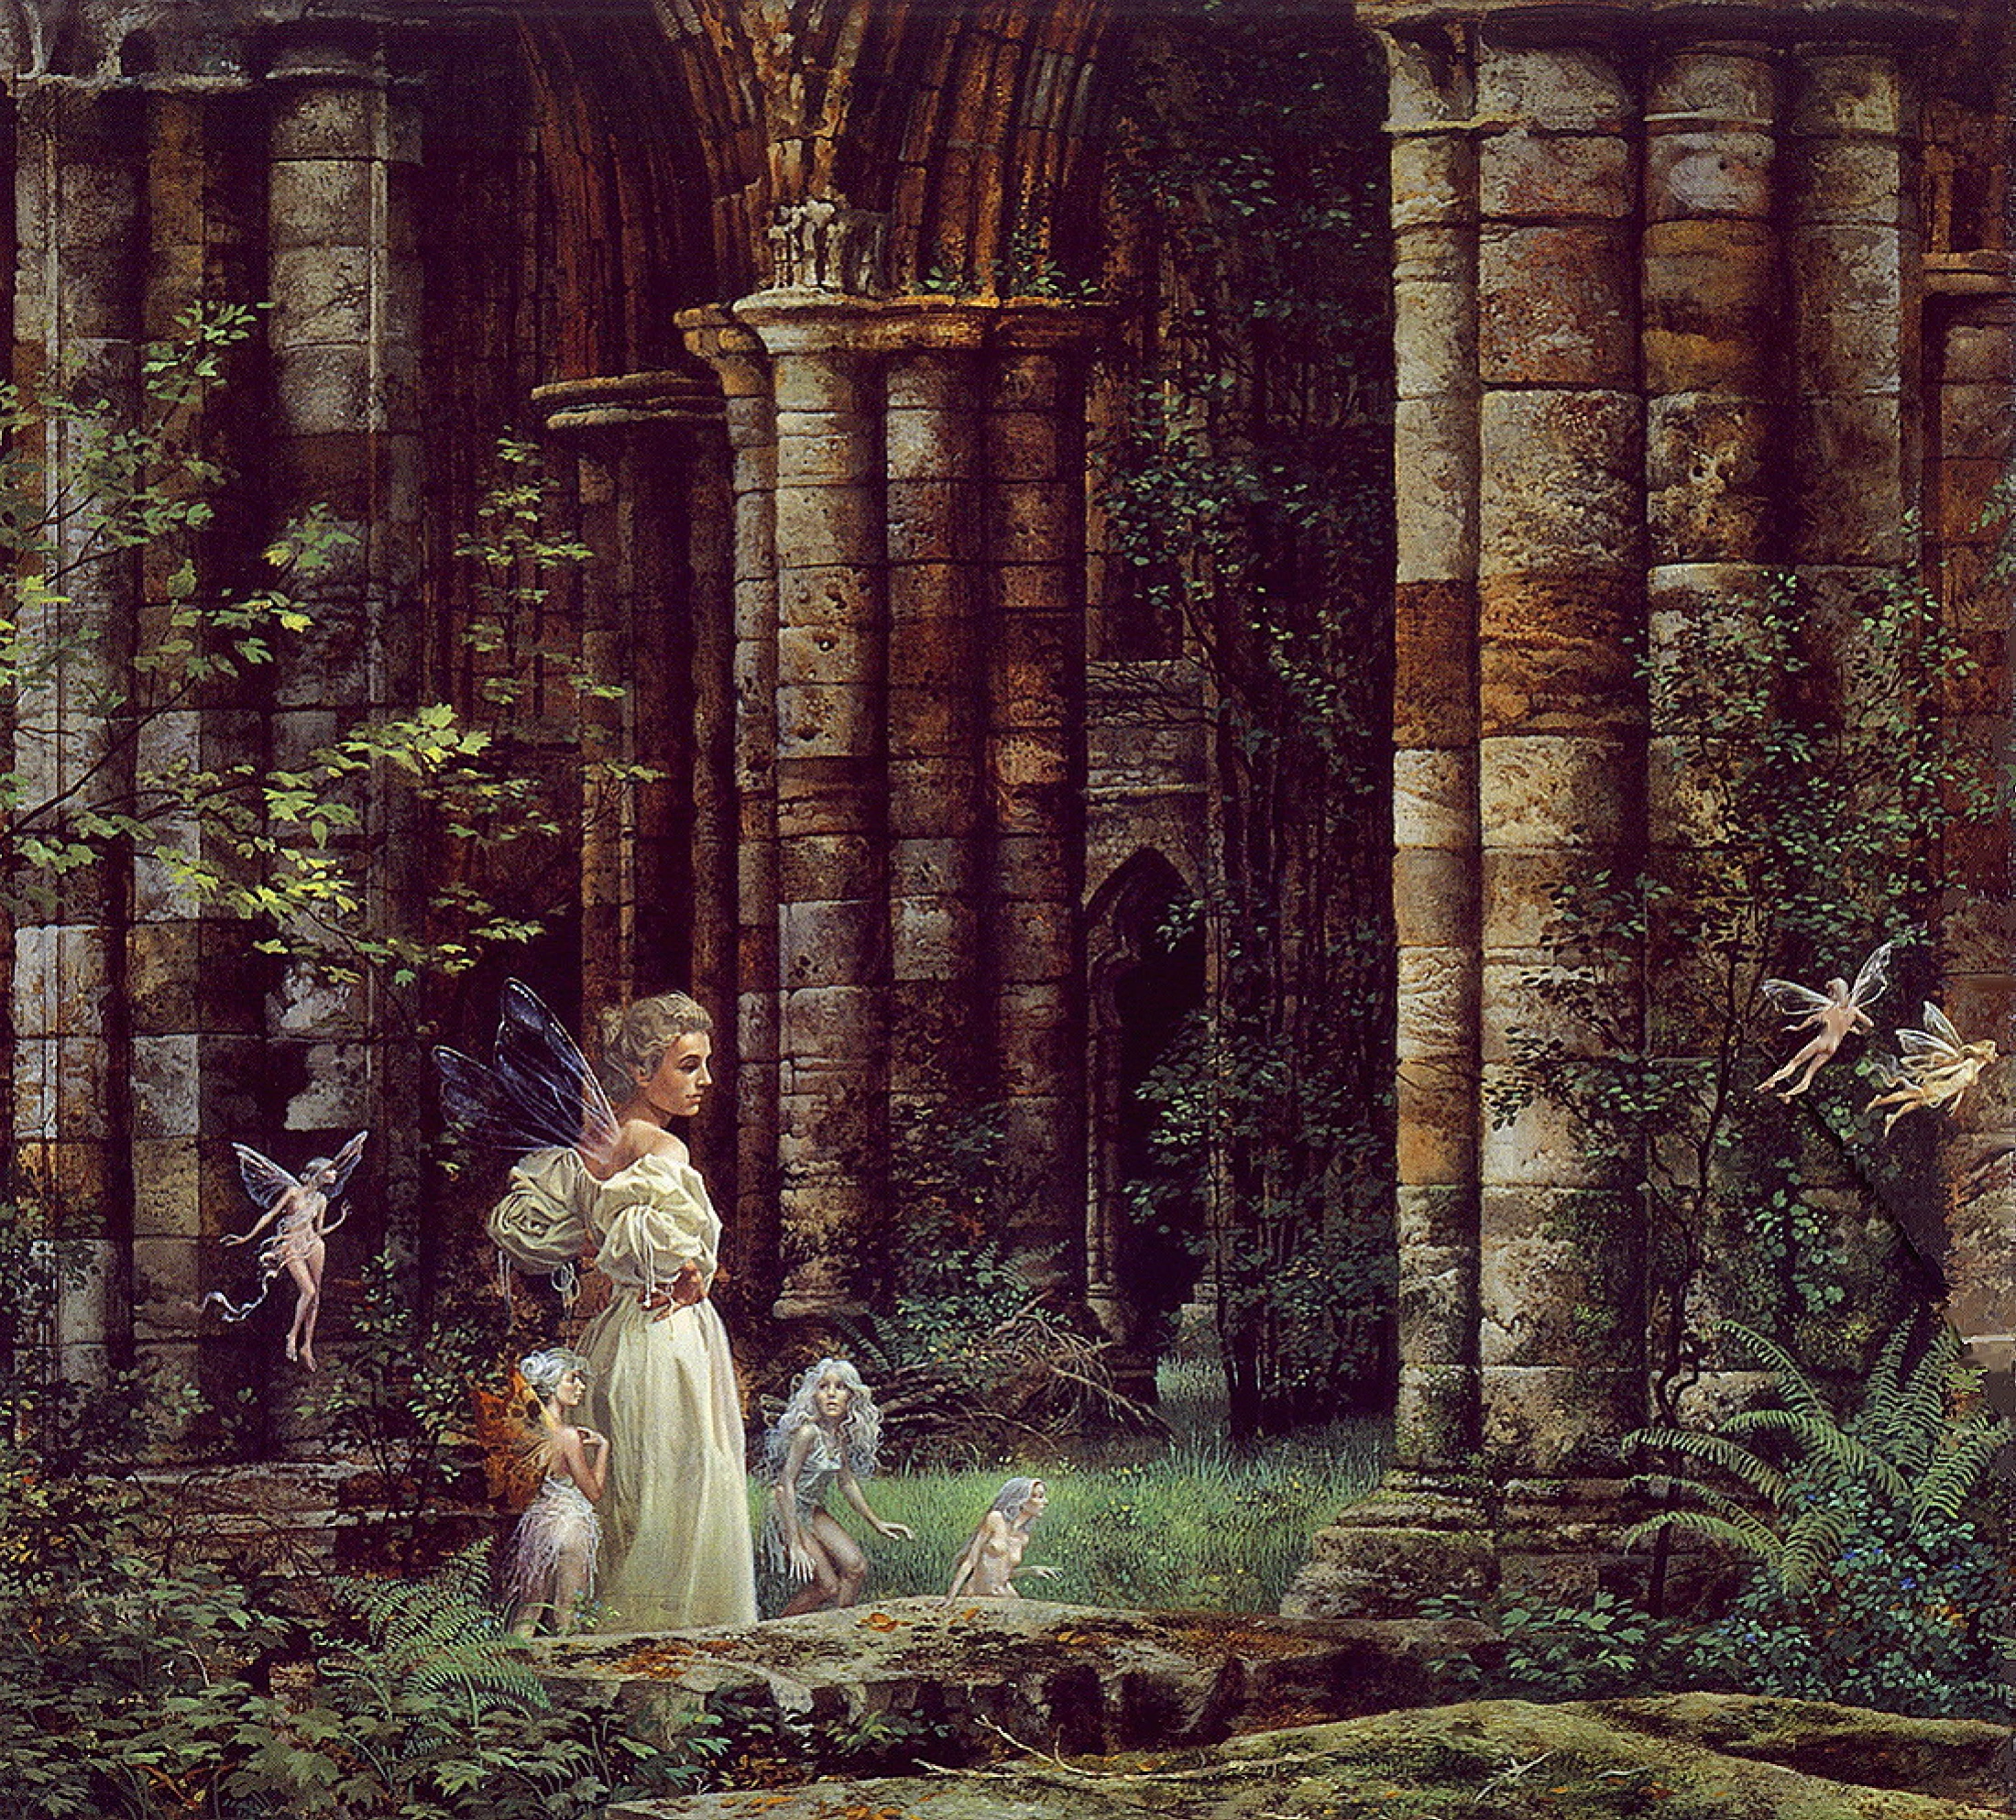 Джеймс Кристенсен «Королева у руин»